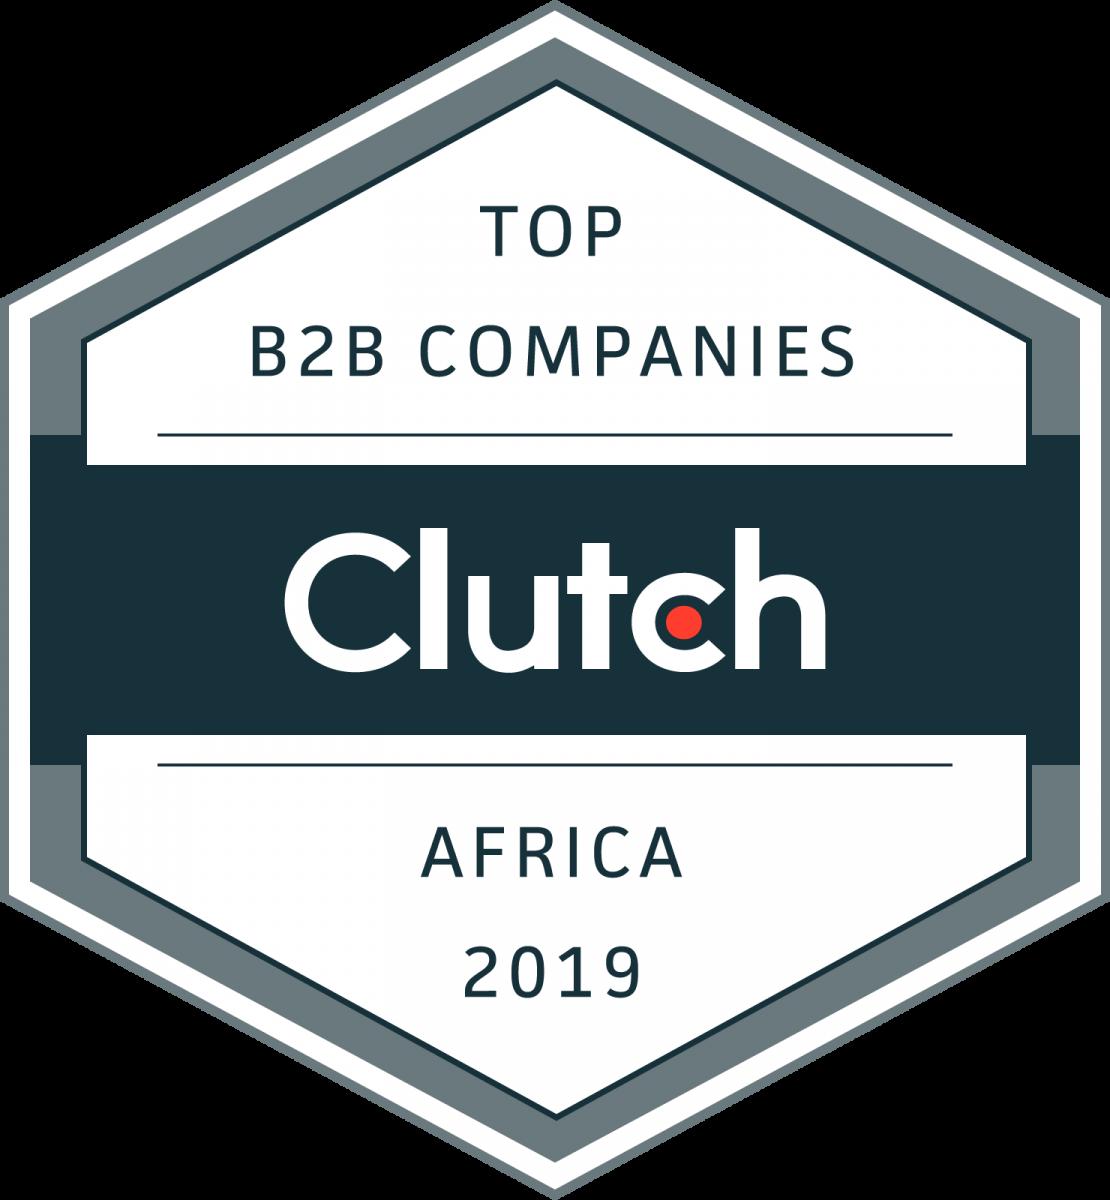 Top B2B Companies in Africa